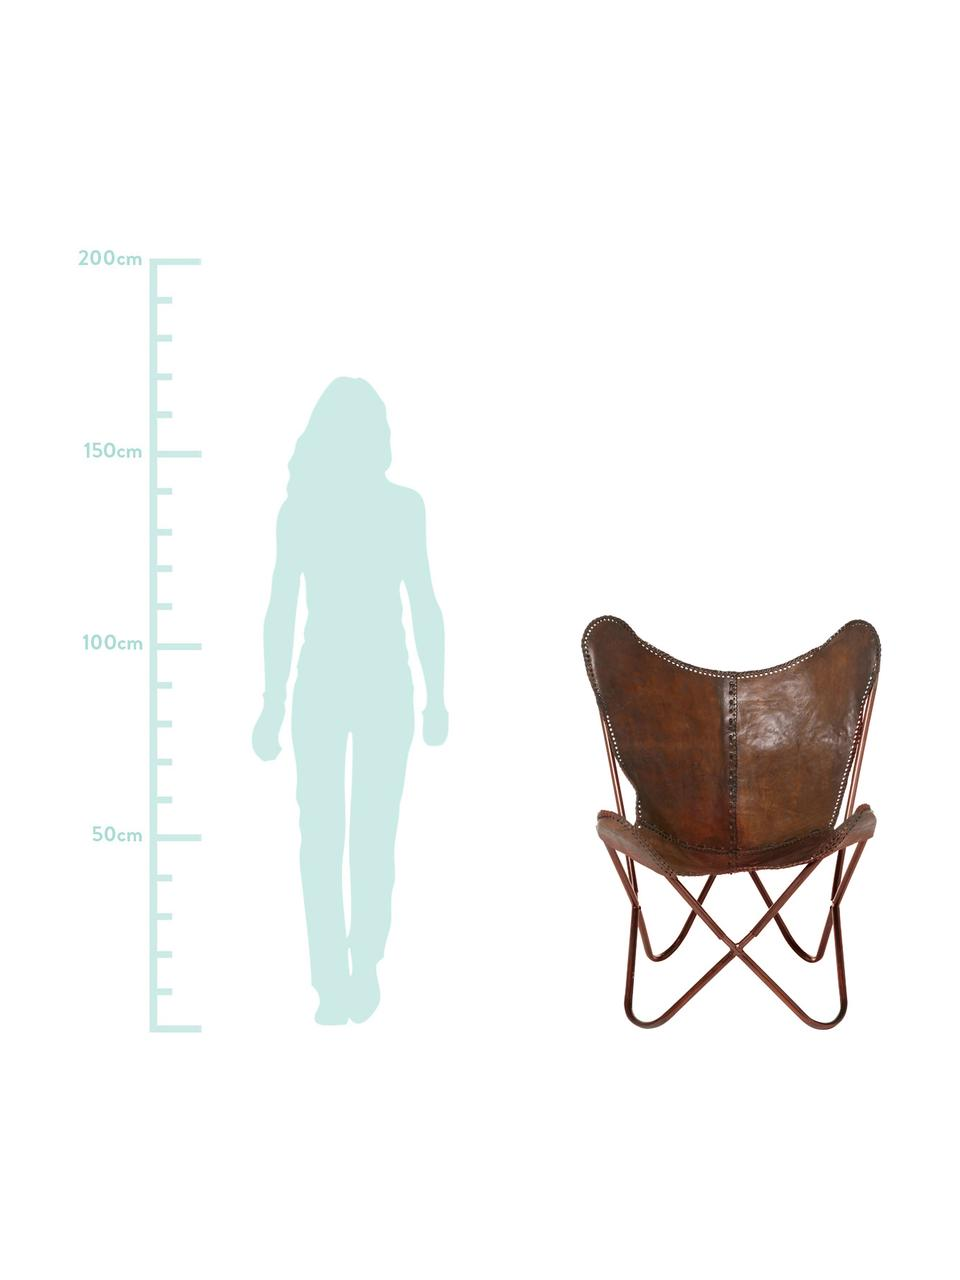 Fotel ze skóry Butterfly, Tapicerka: skóra bydlęca, Brązowy, S 80 x W 87 cm